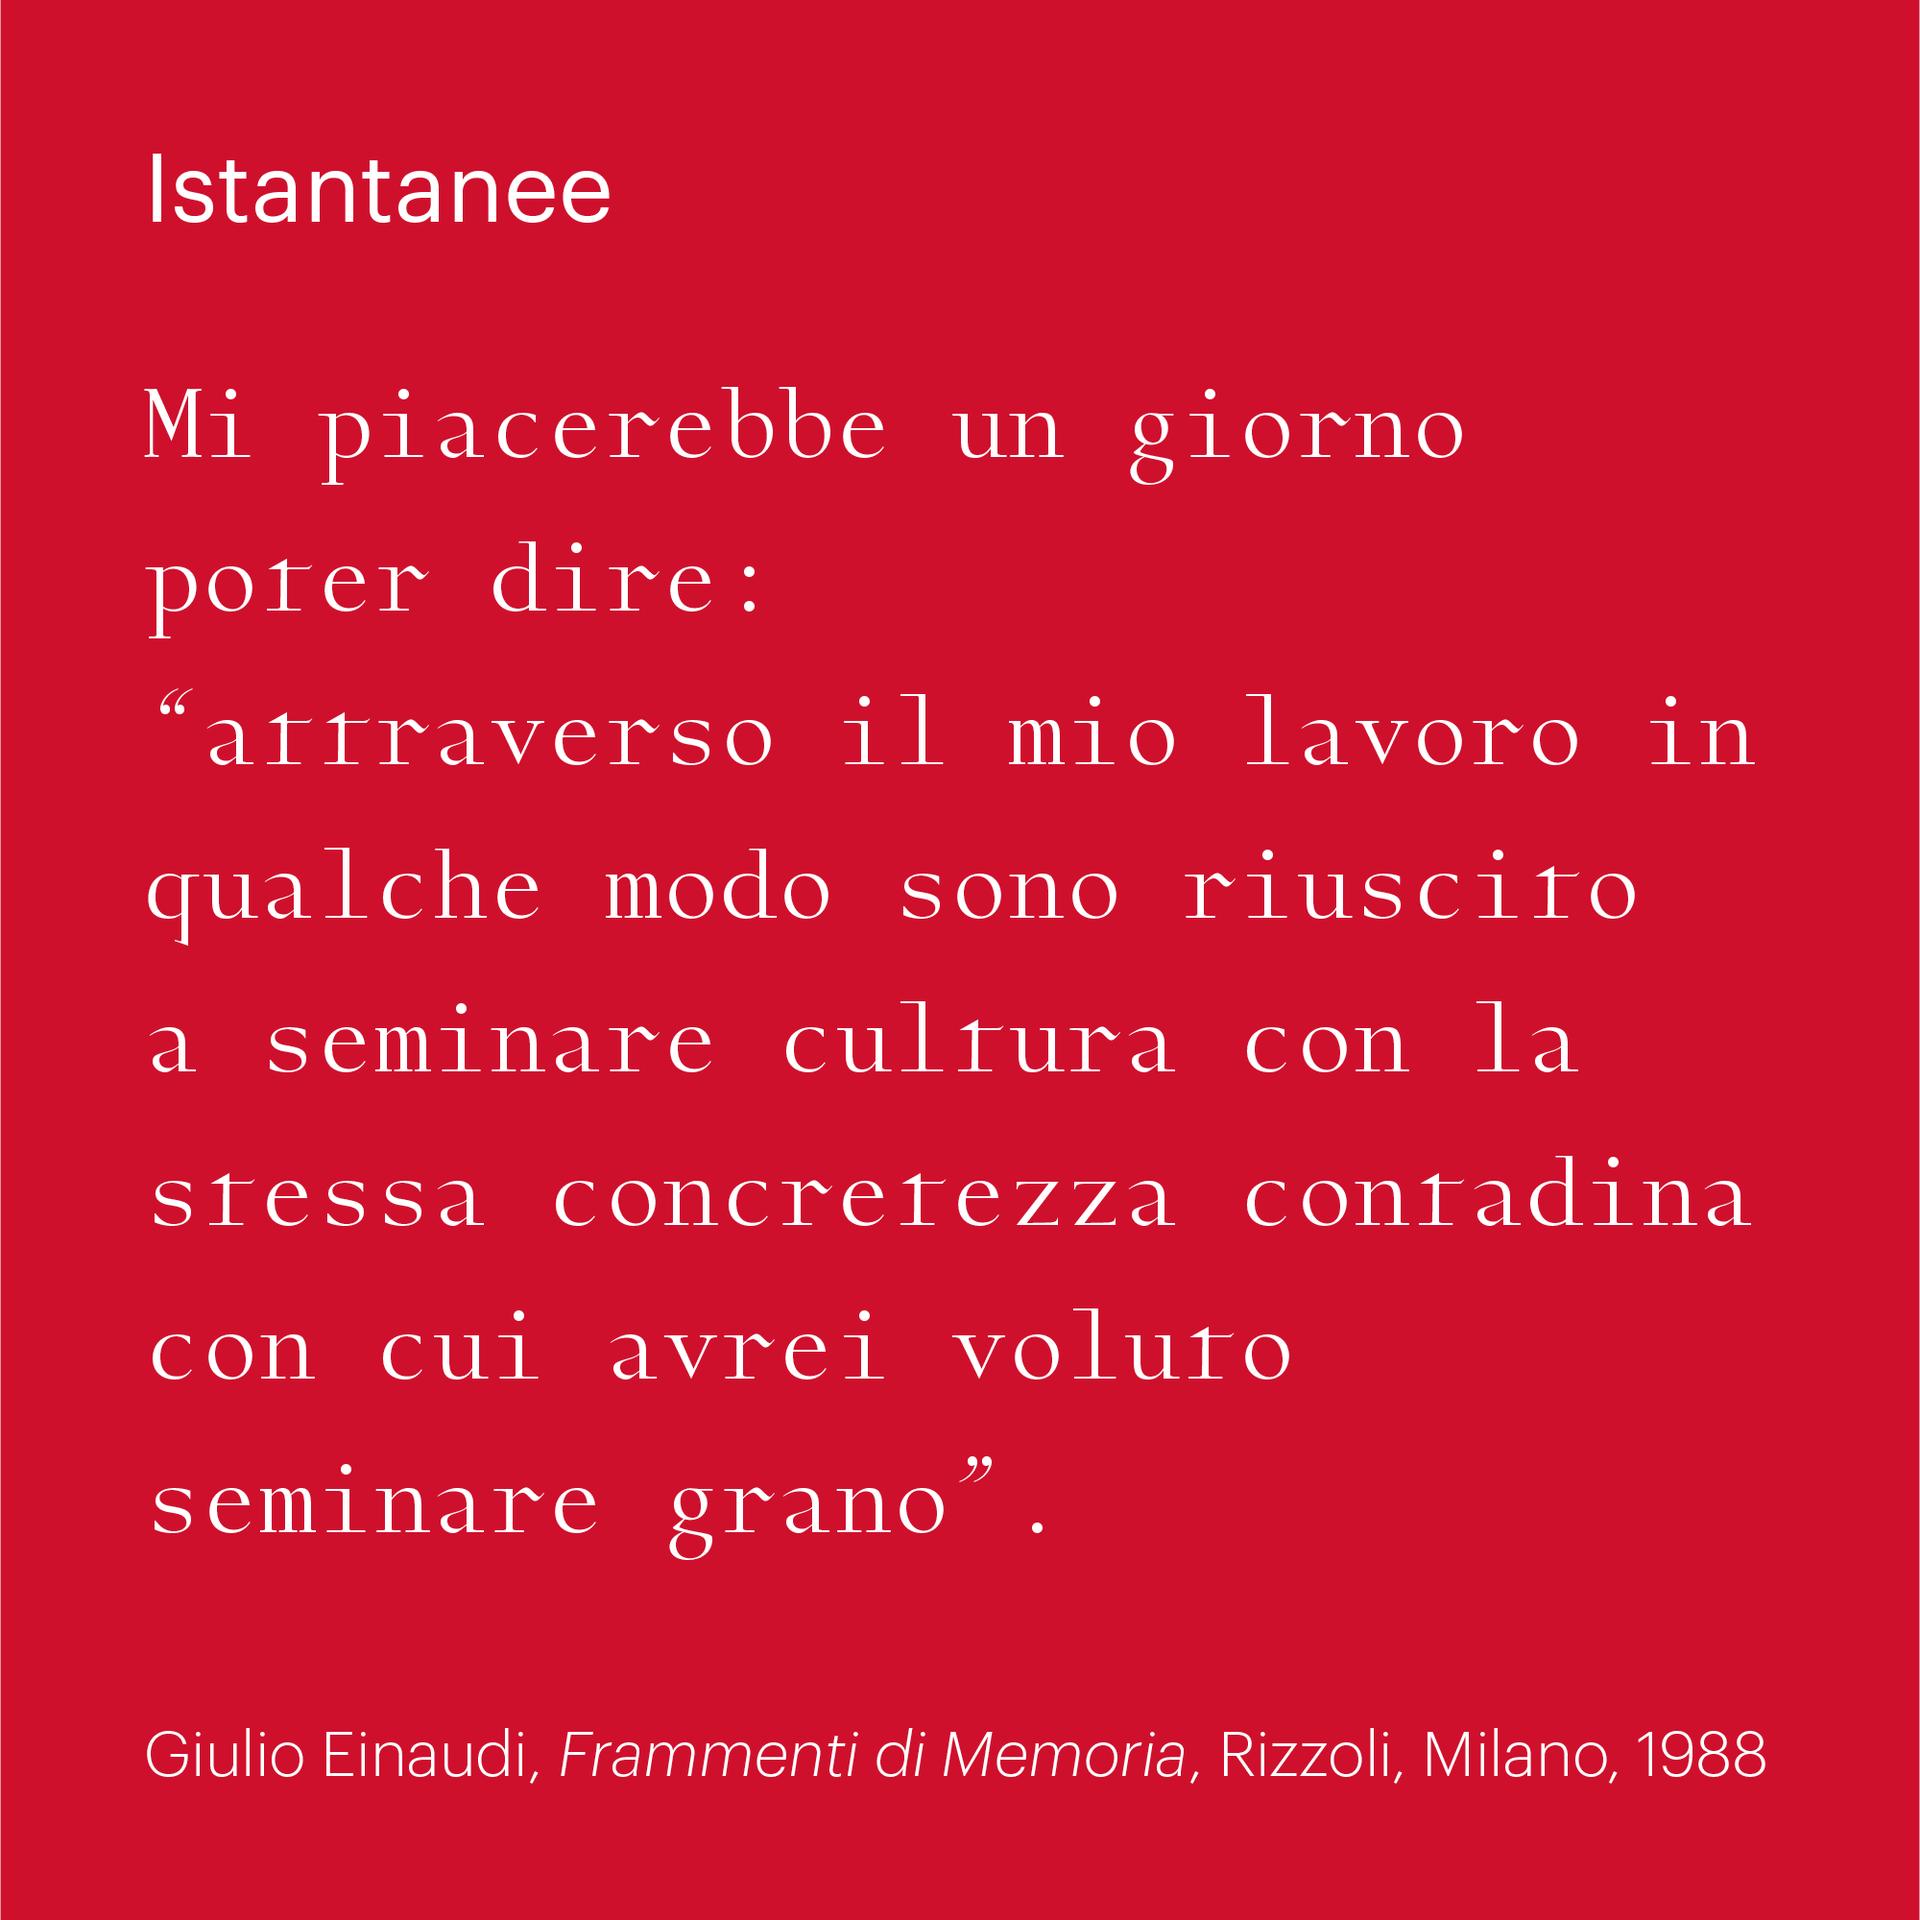 Istantanee – 25 years